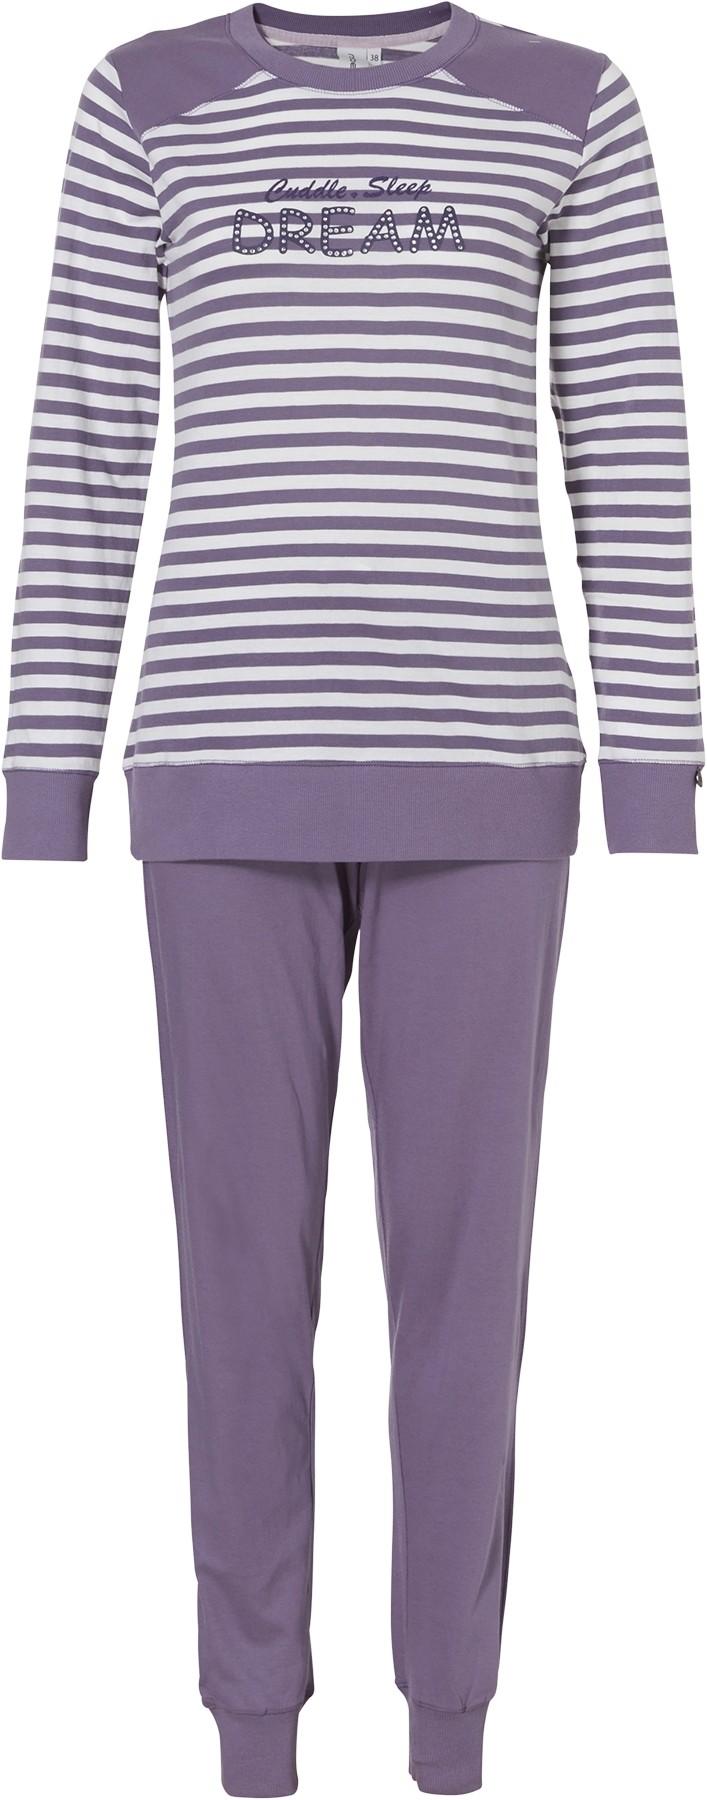 Image of Dames pyjama Rebelle 2172-215-2-36